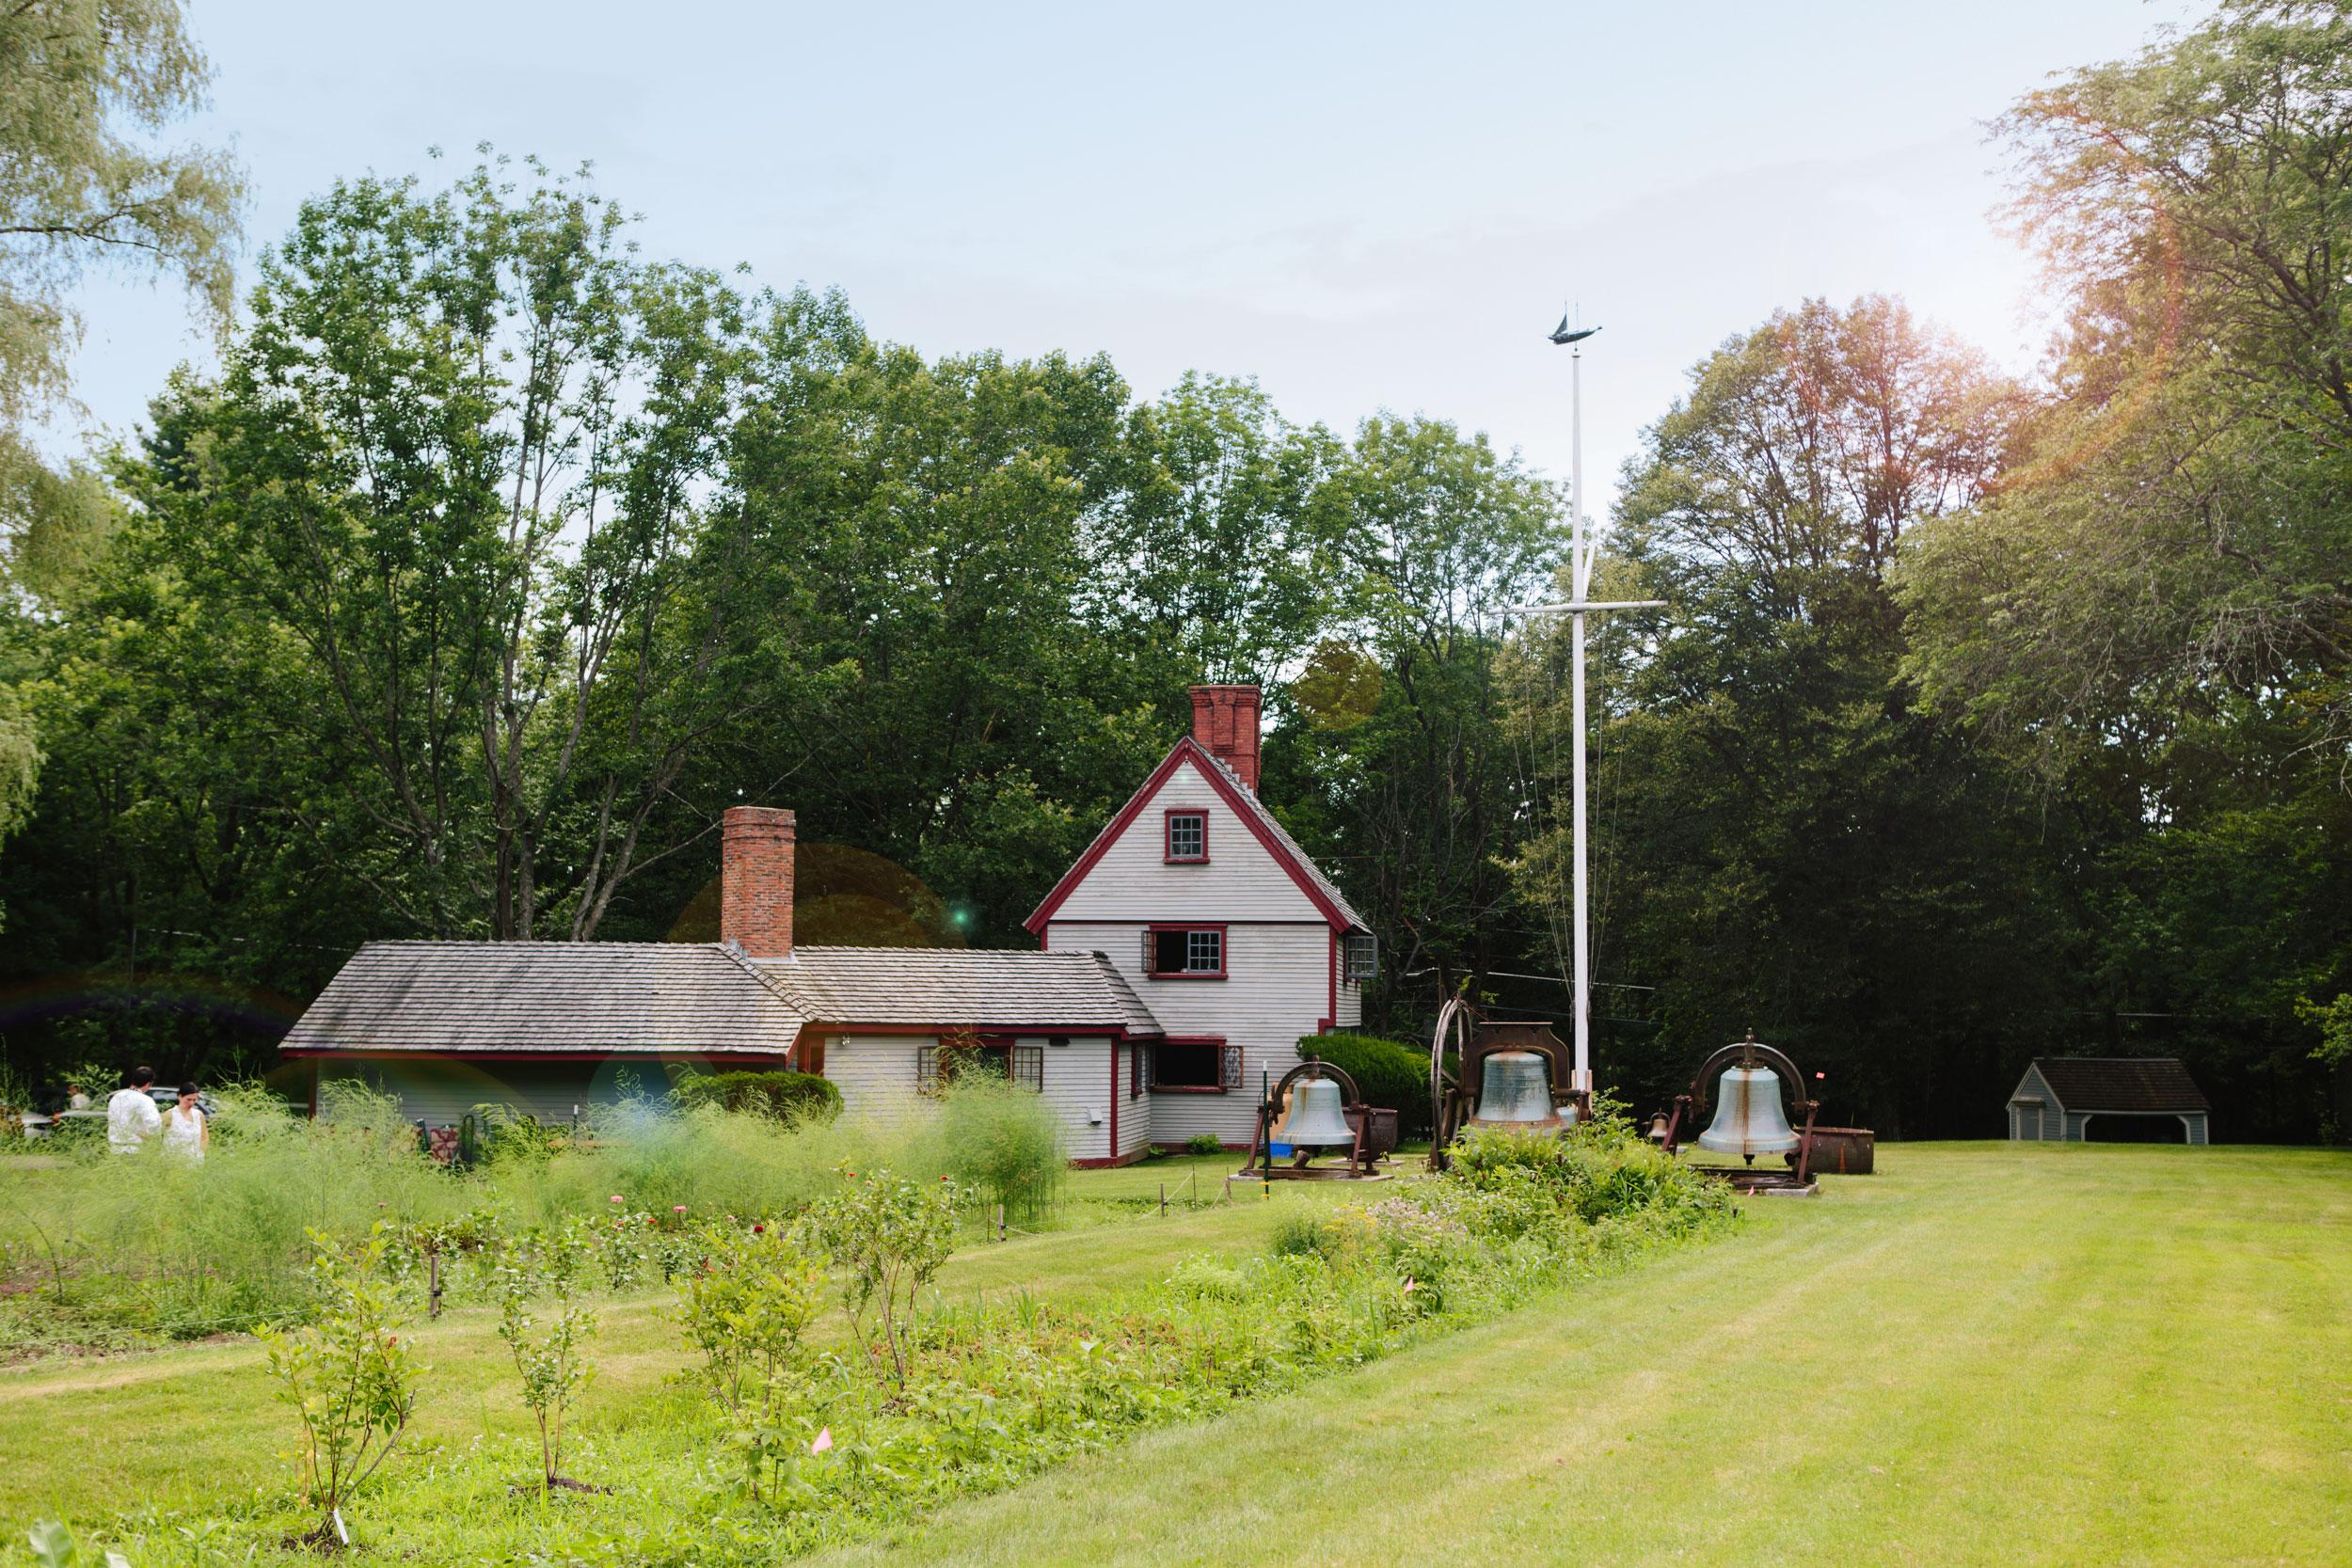 The Little House at Saltbox Farm